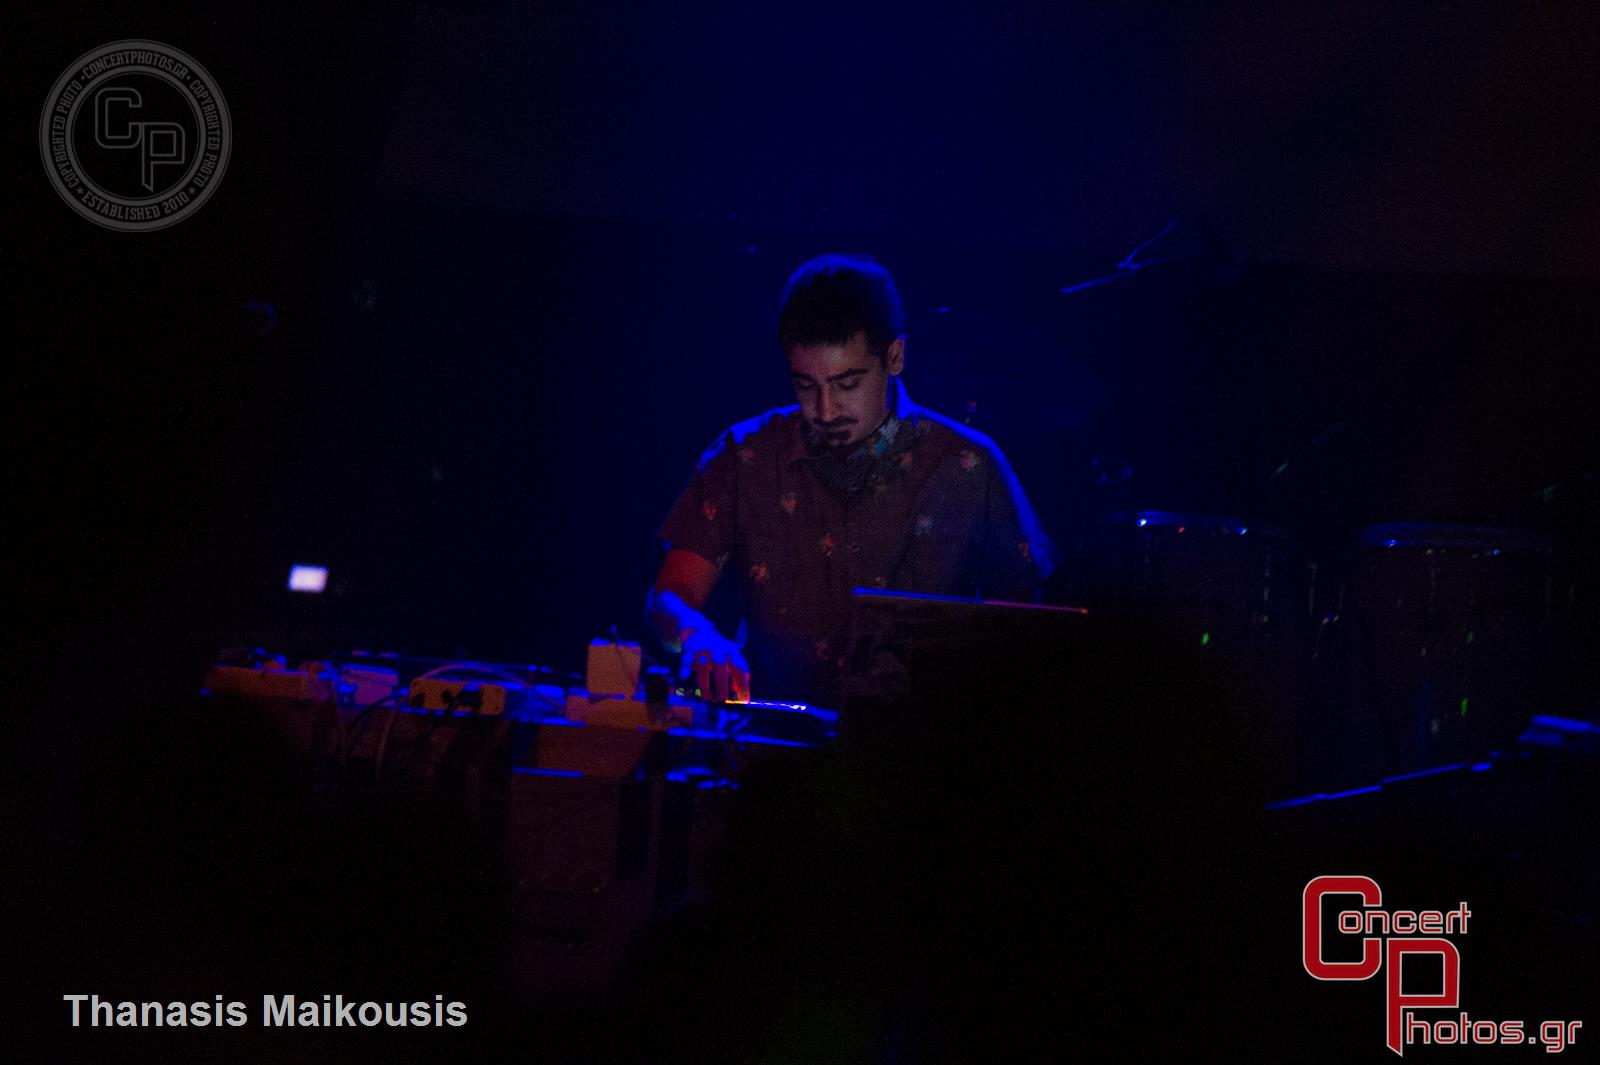 Quantic & Kill Emil -Quantic Kill Emil Gagarin photographer: Thanasis Maikousis - ConcertPhotos - 20141023_2212_49